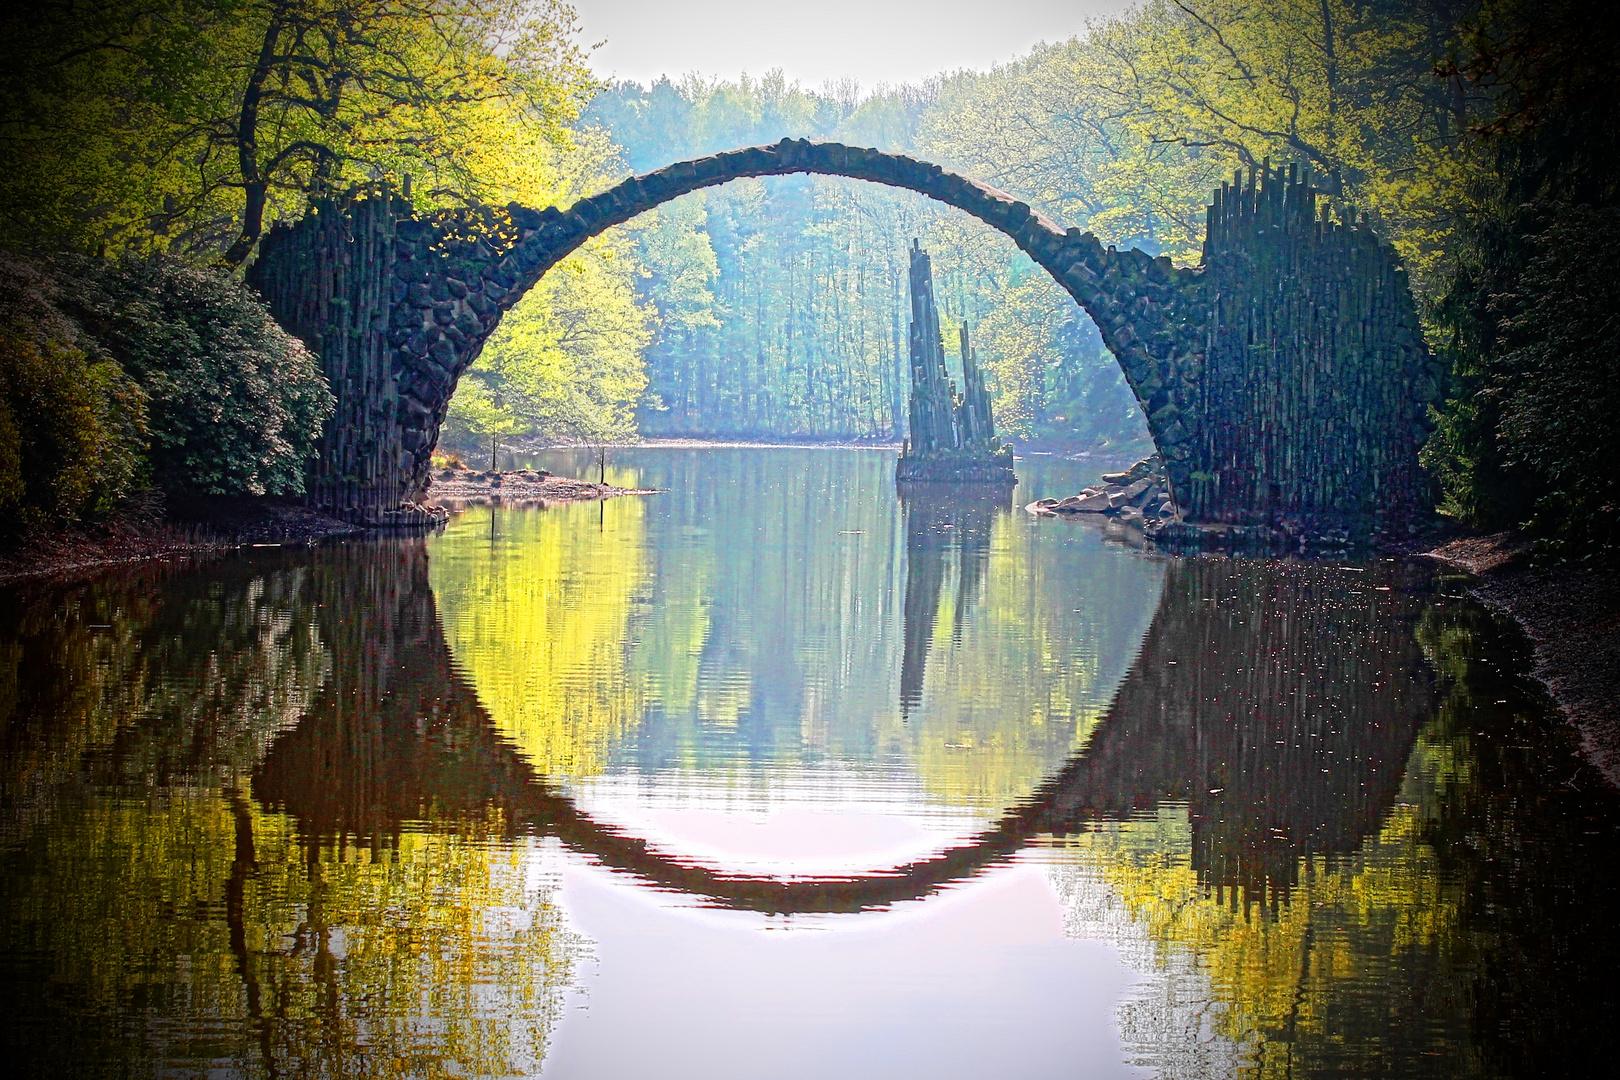 Rakotzbrücke in Kromlau am Morgen